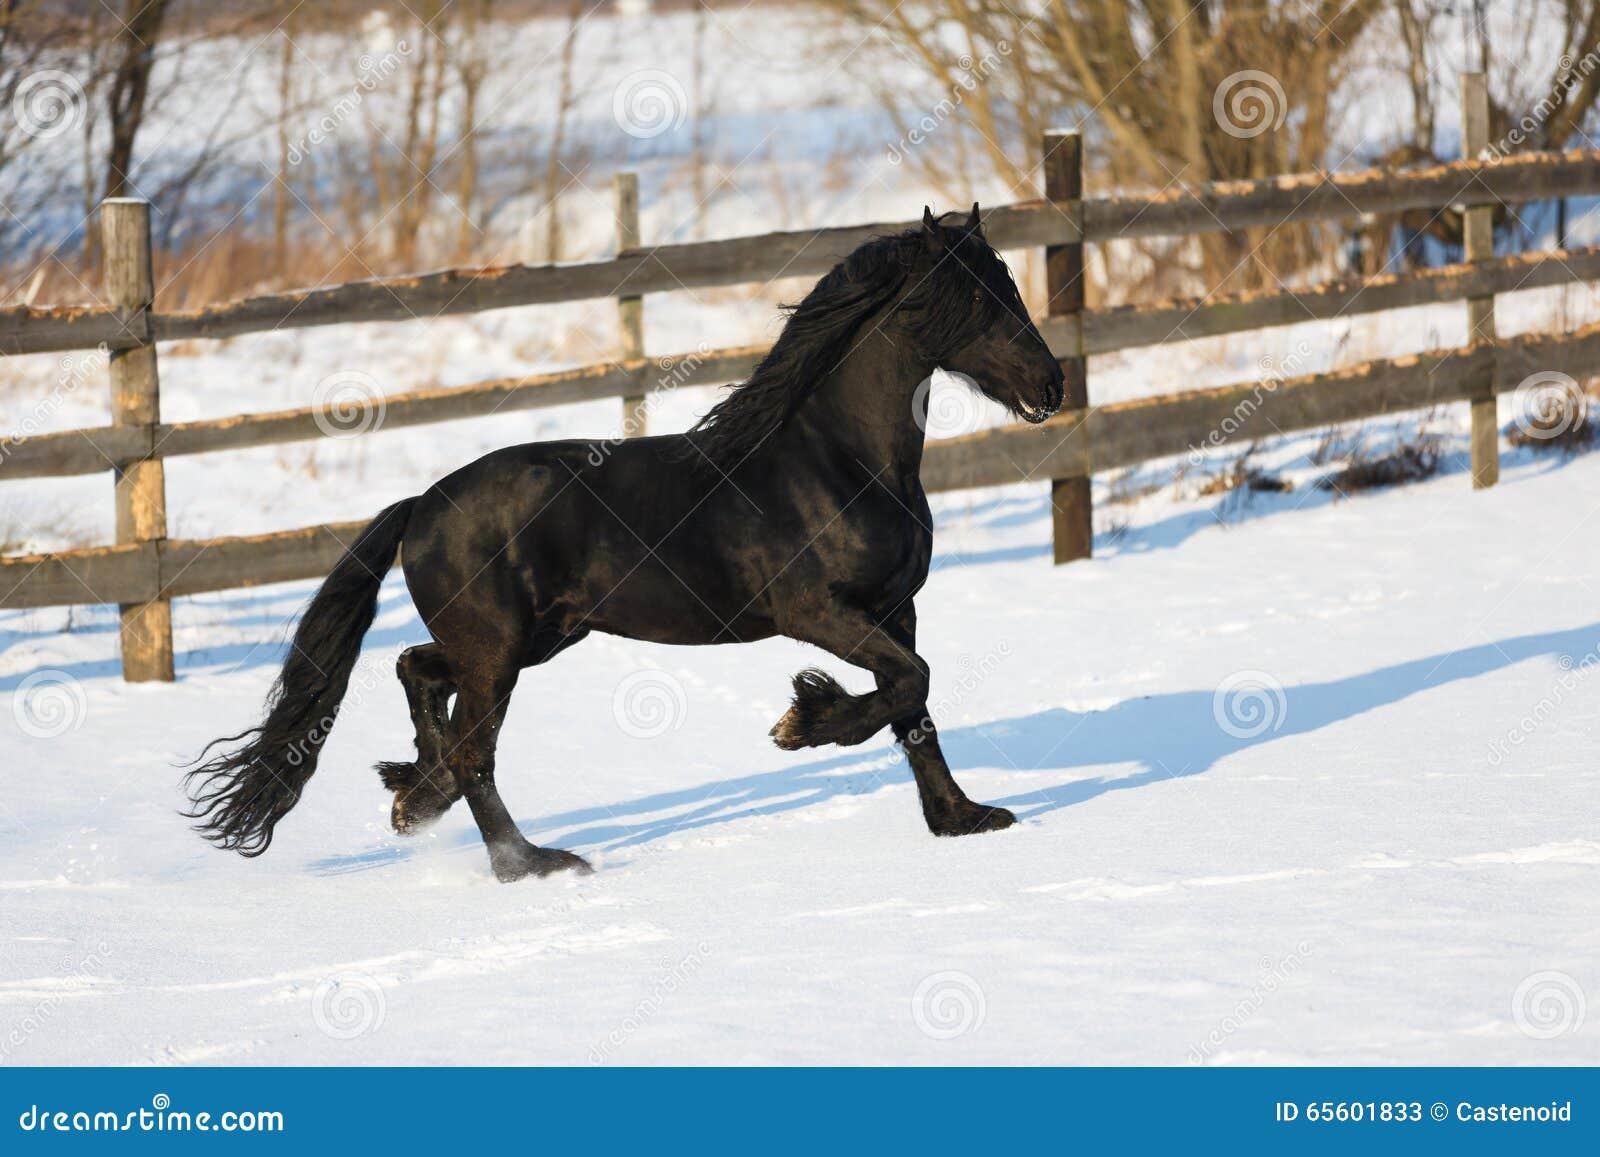 Black frisian horse in winter